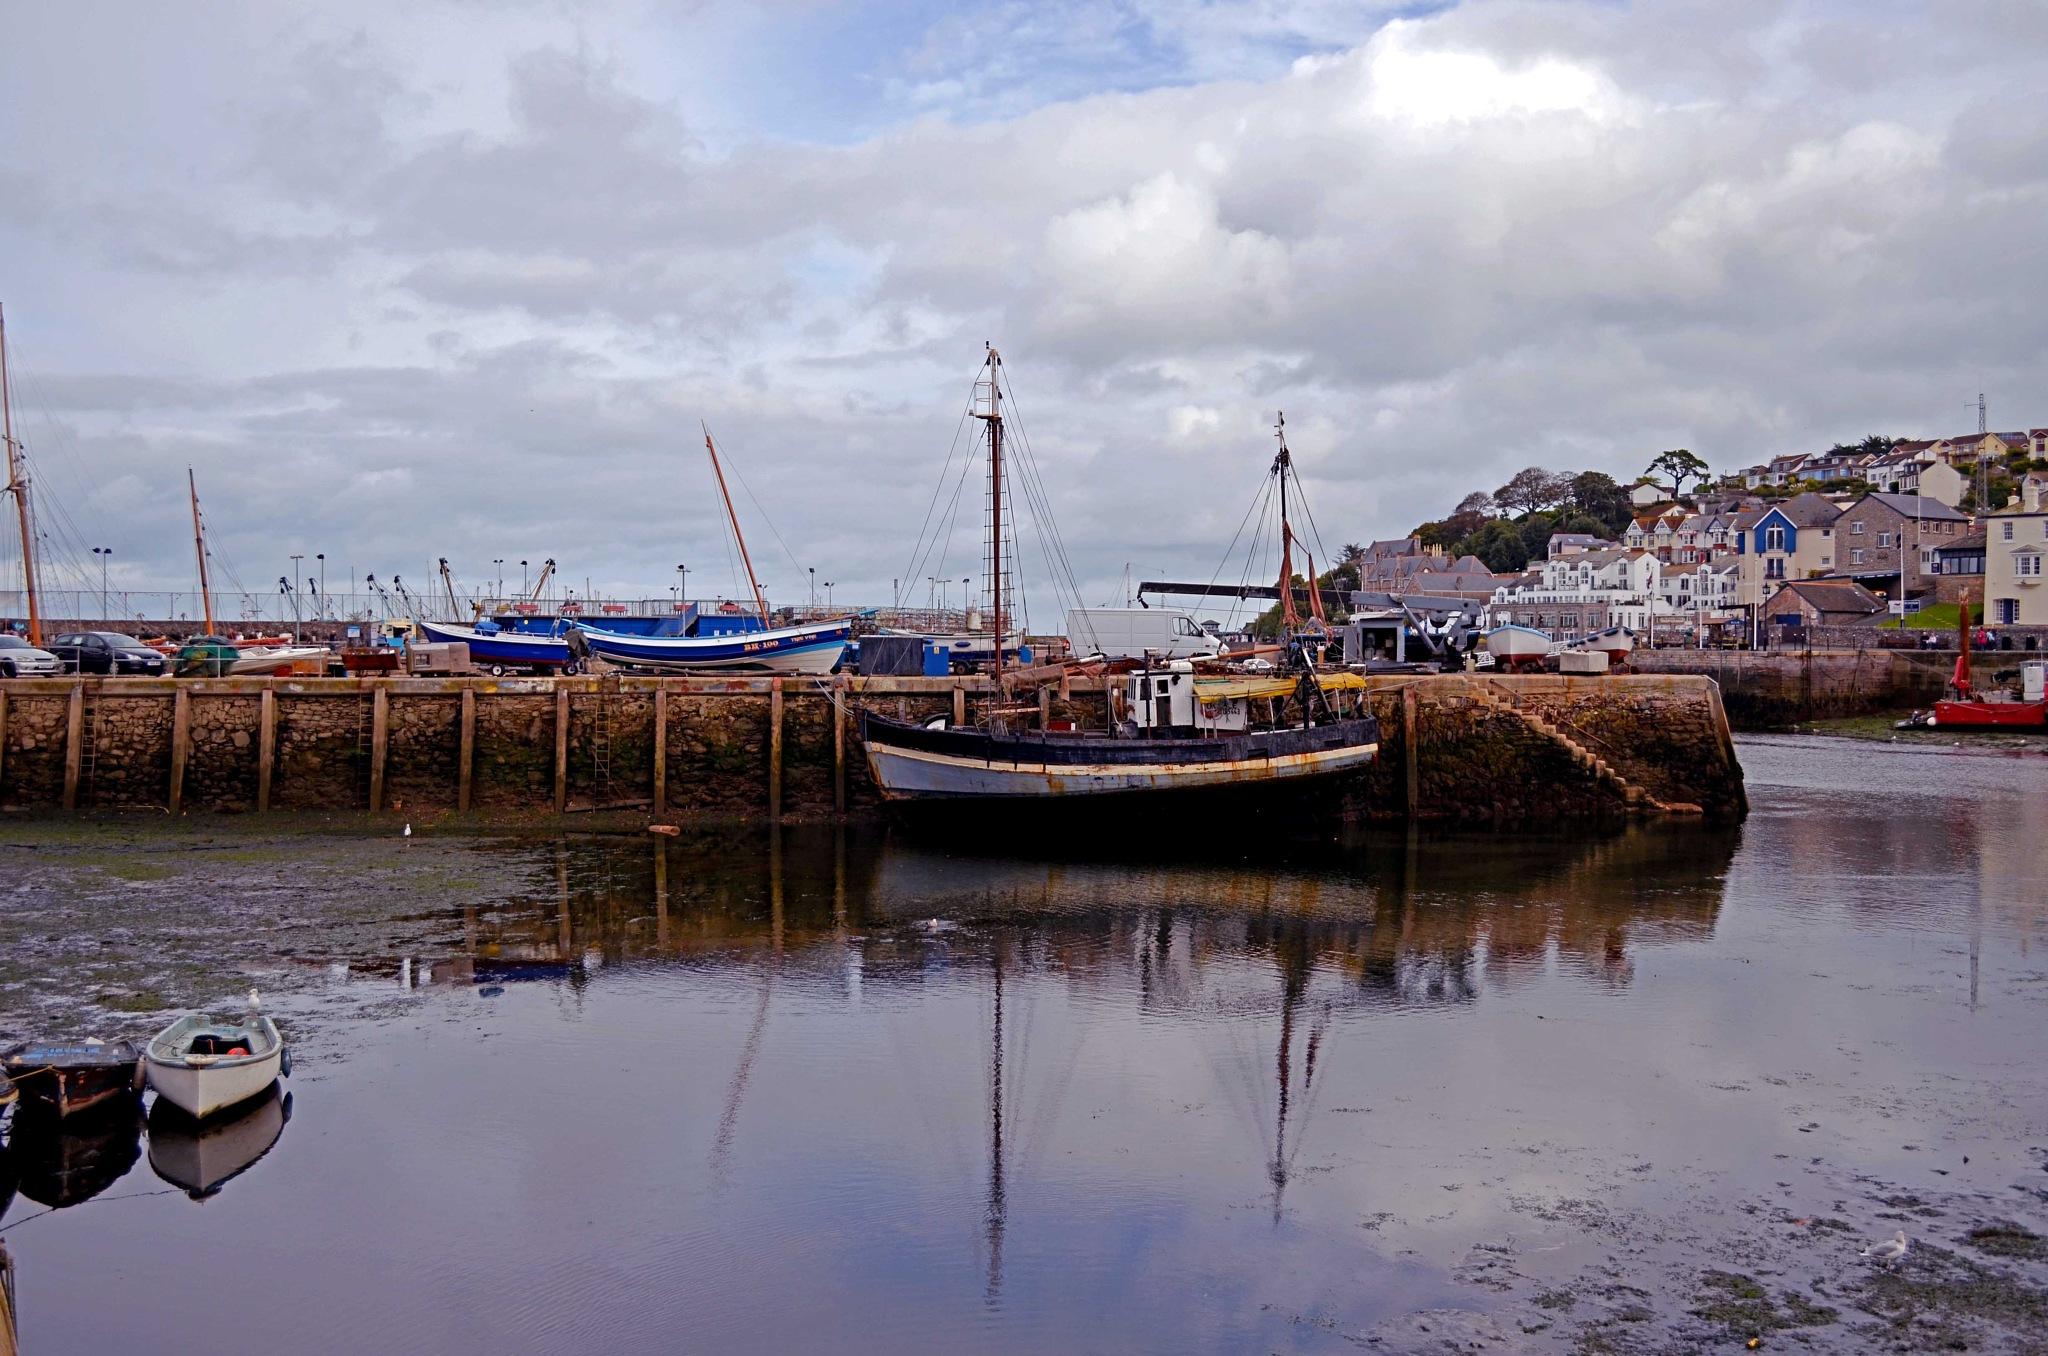 Harbour side by edwinphillips